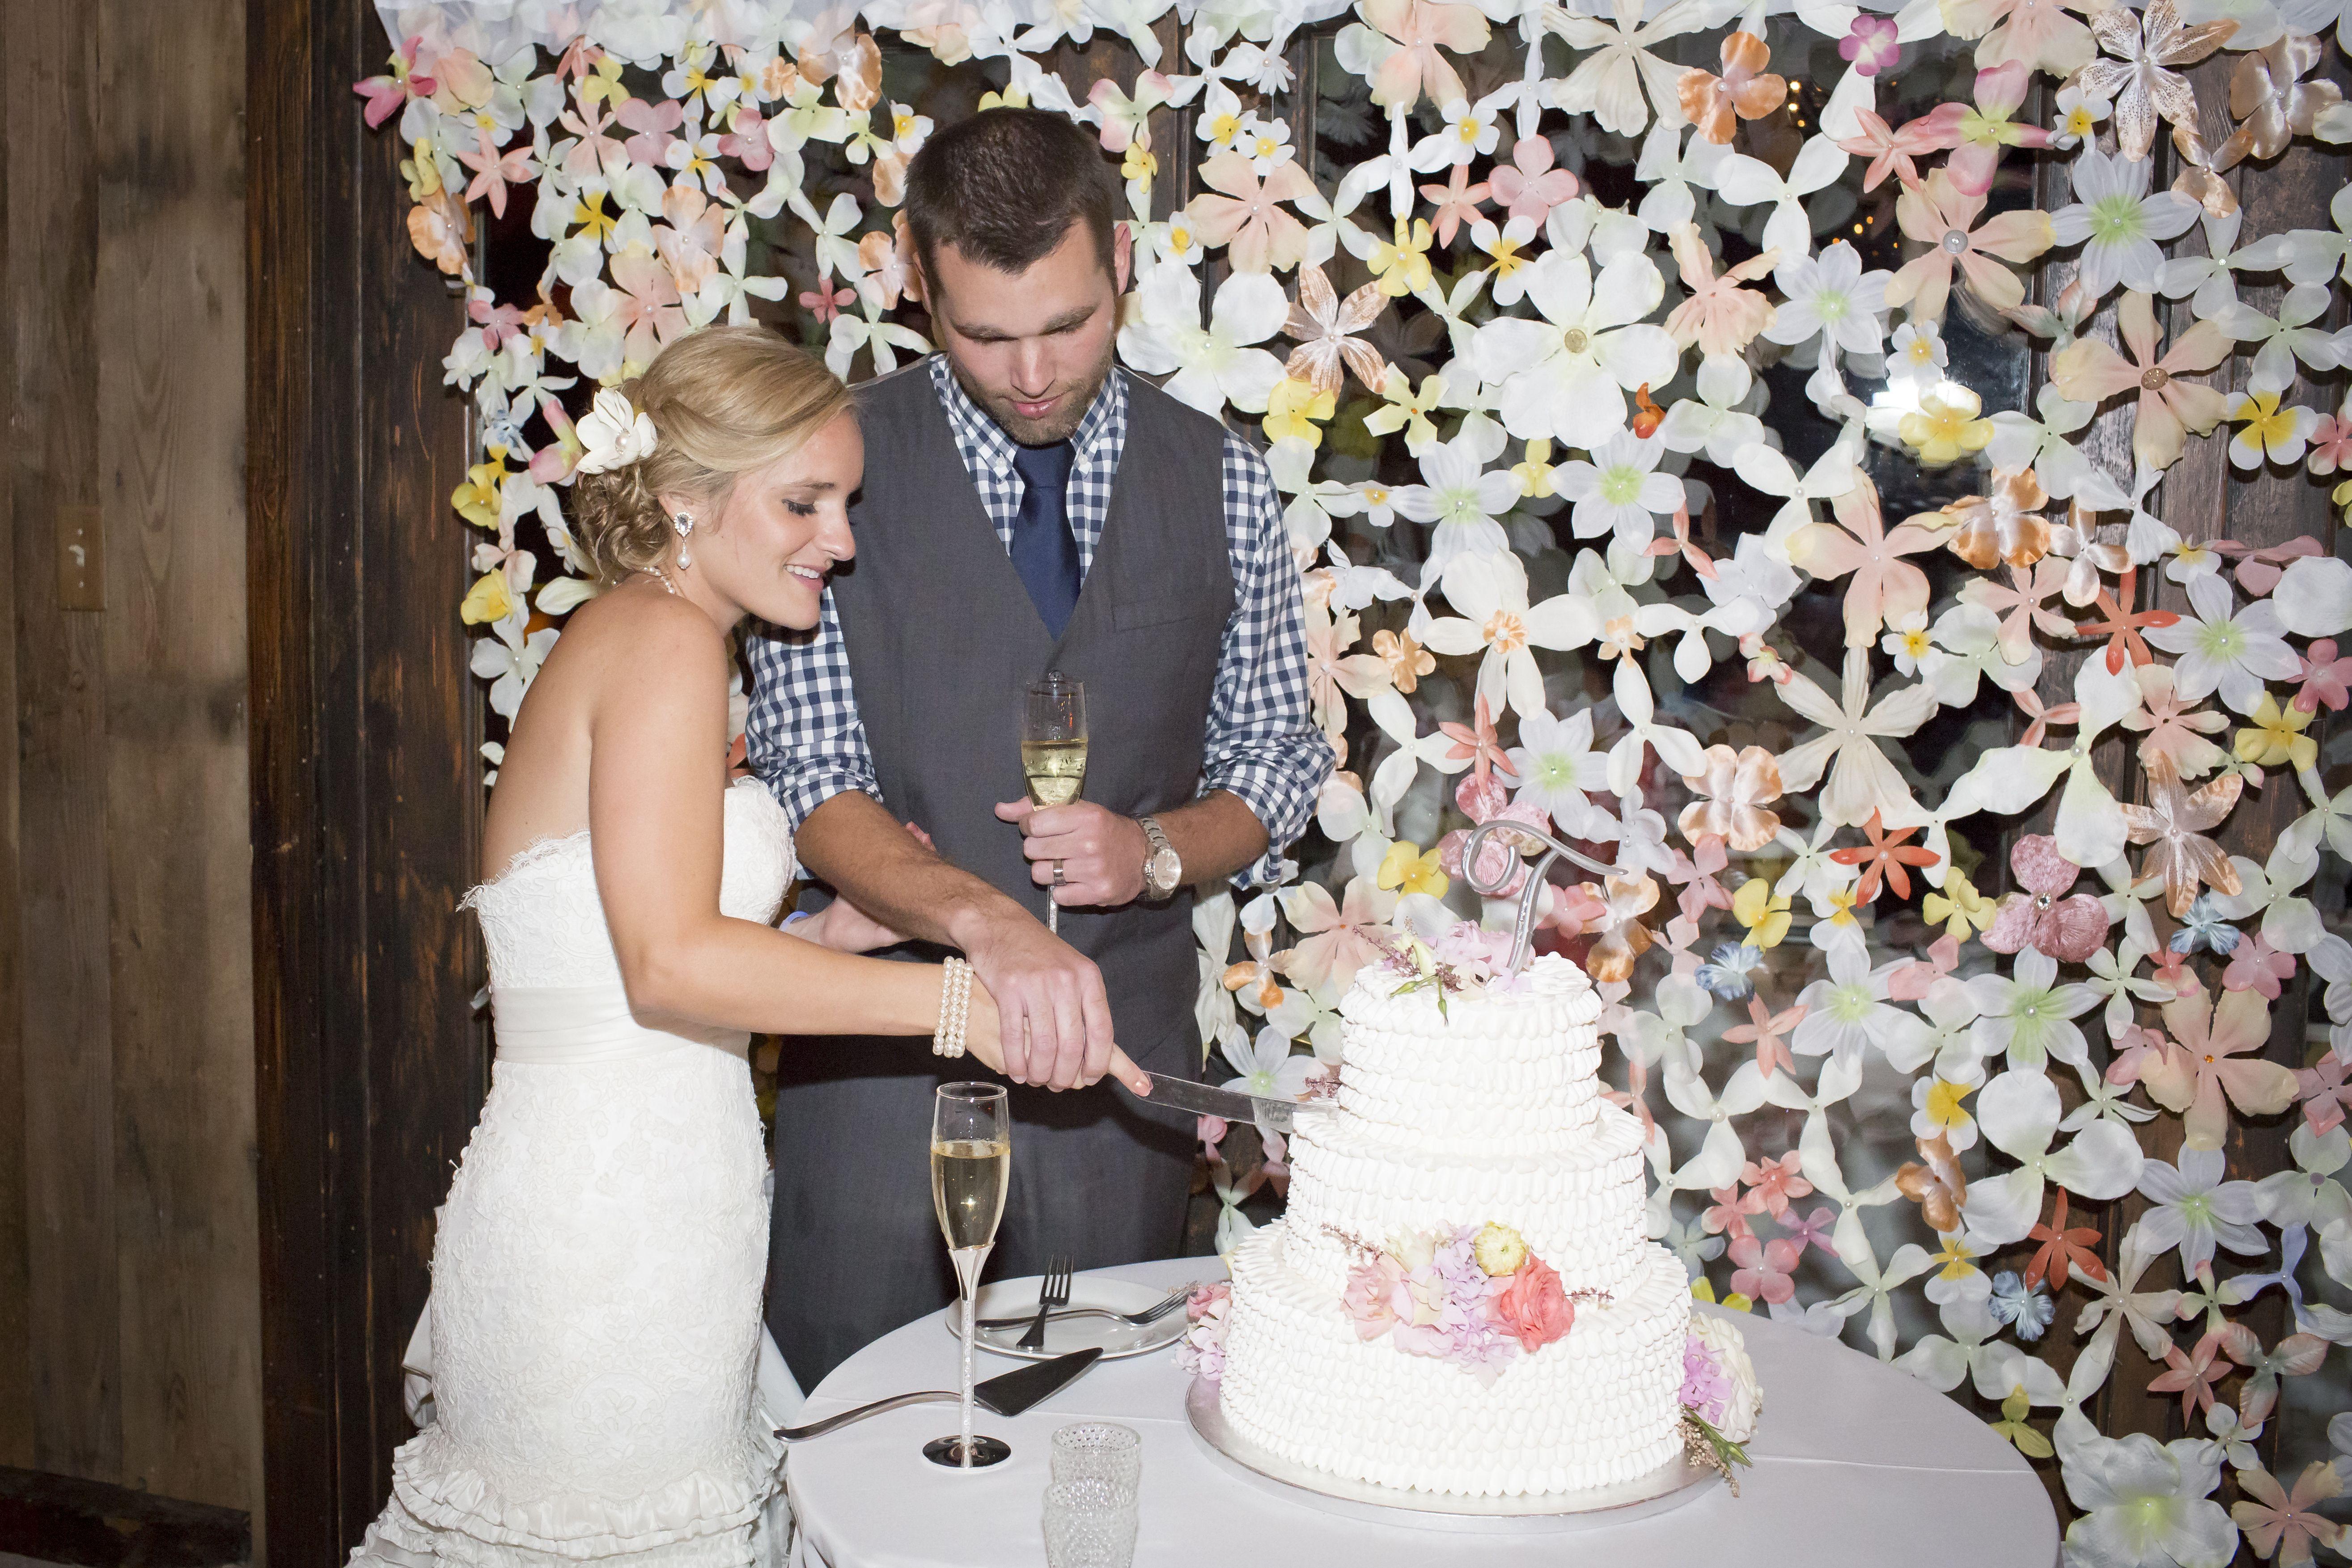 Wedding decorationhandmade flower curtain made by sewing together wedding decorationhandmade flower curtain made by sewing together silk flowers junglespirit Choice Image